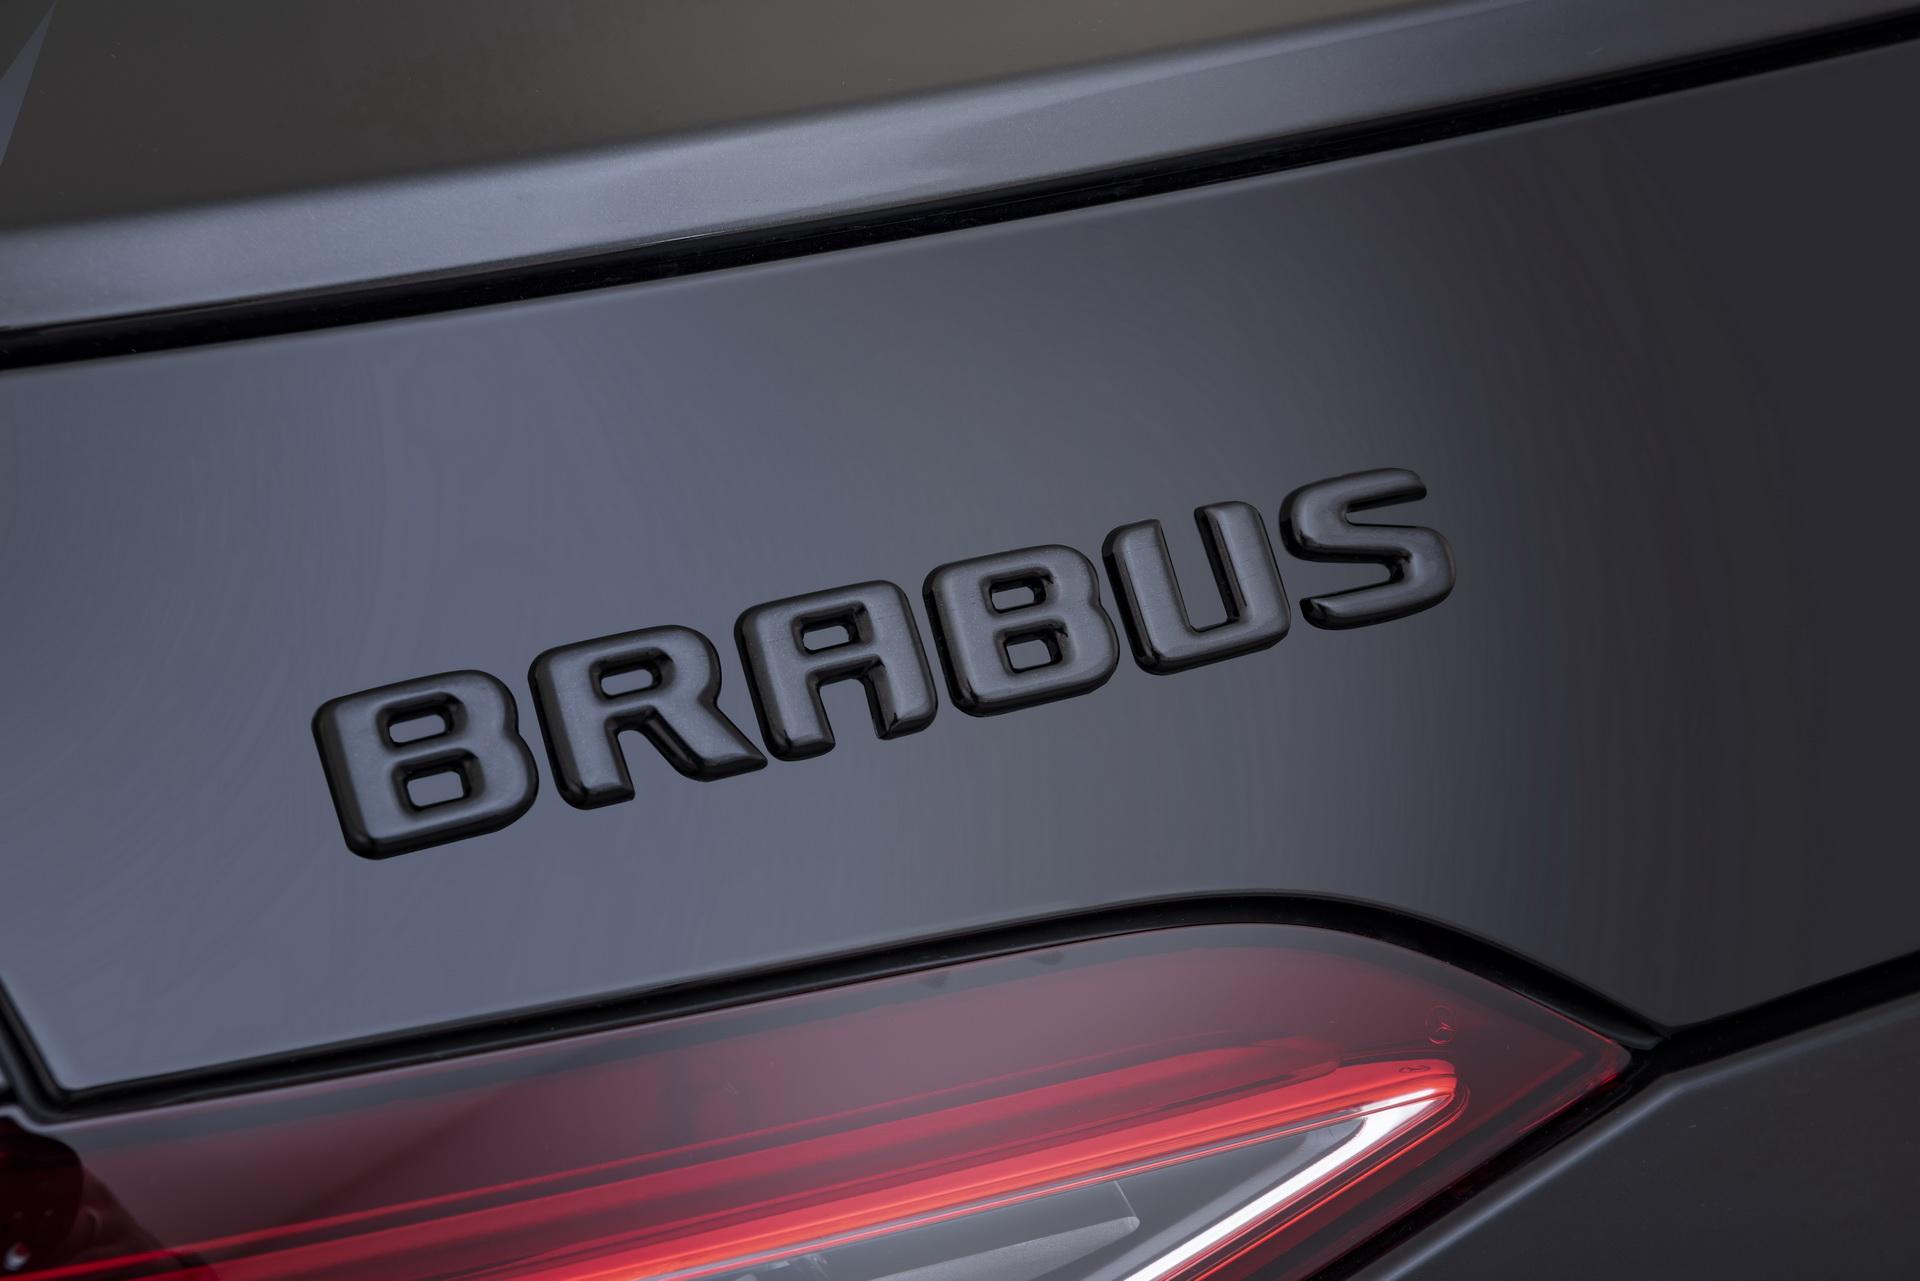 Brabus Rear Logo